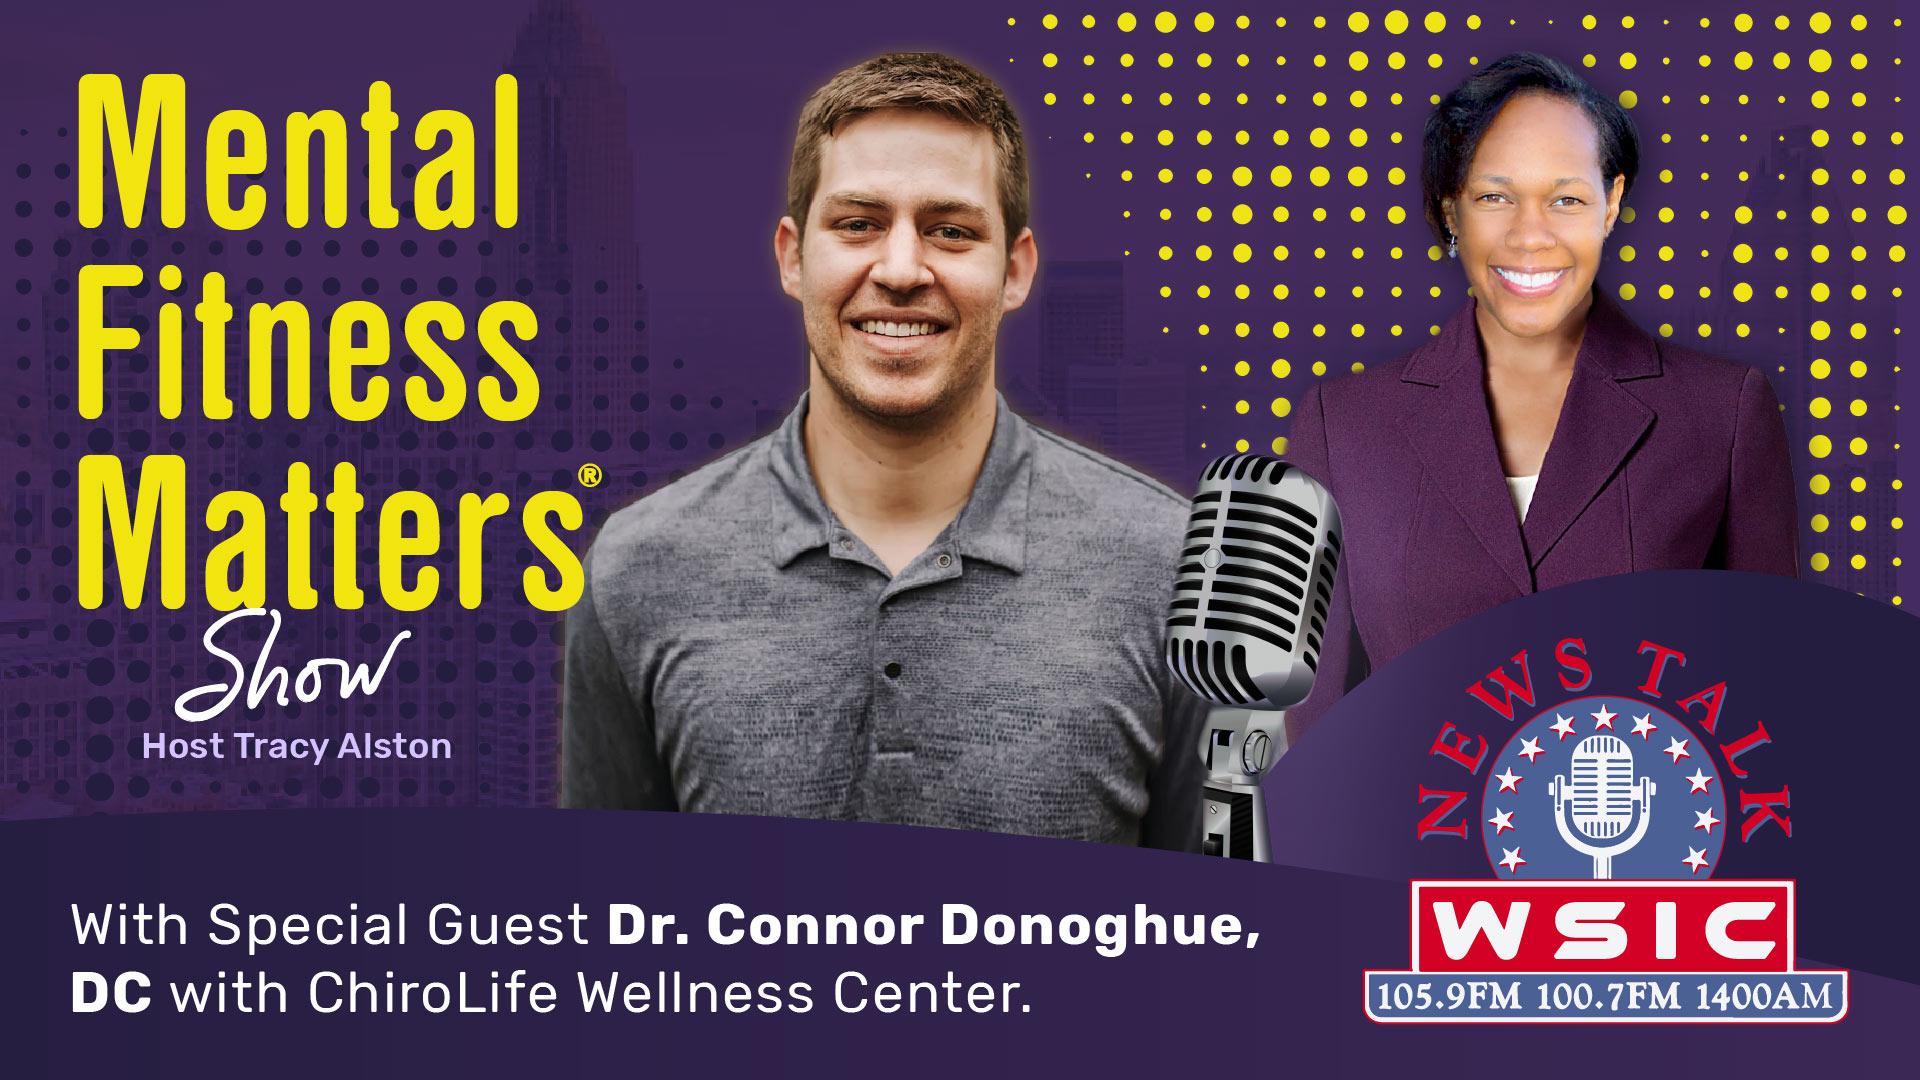 Dr. Connor Donoghue, of ChiroLife Wellness Center